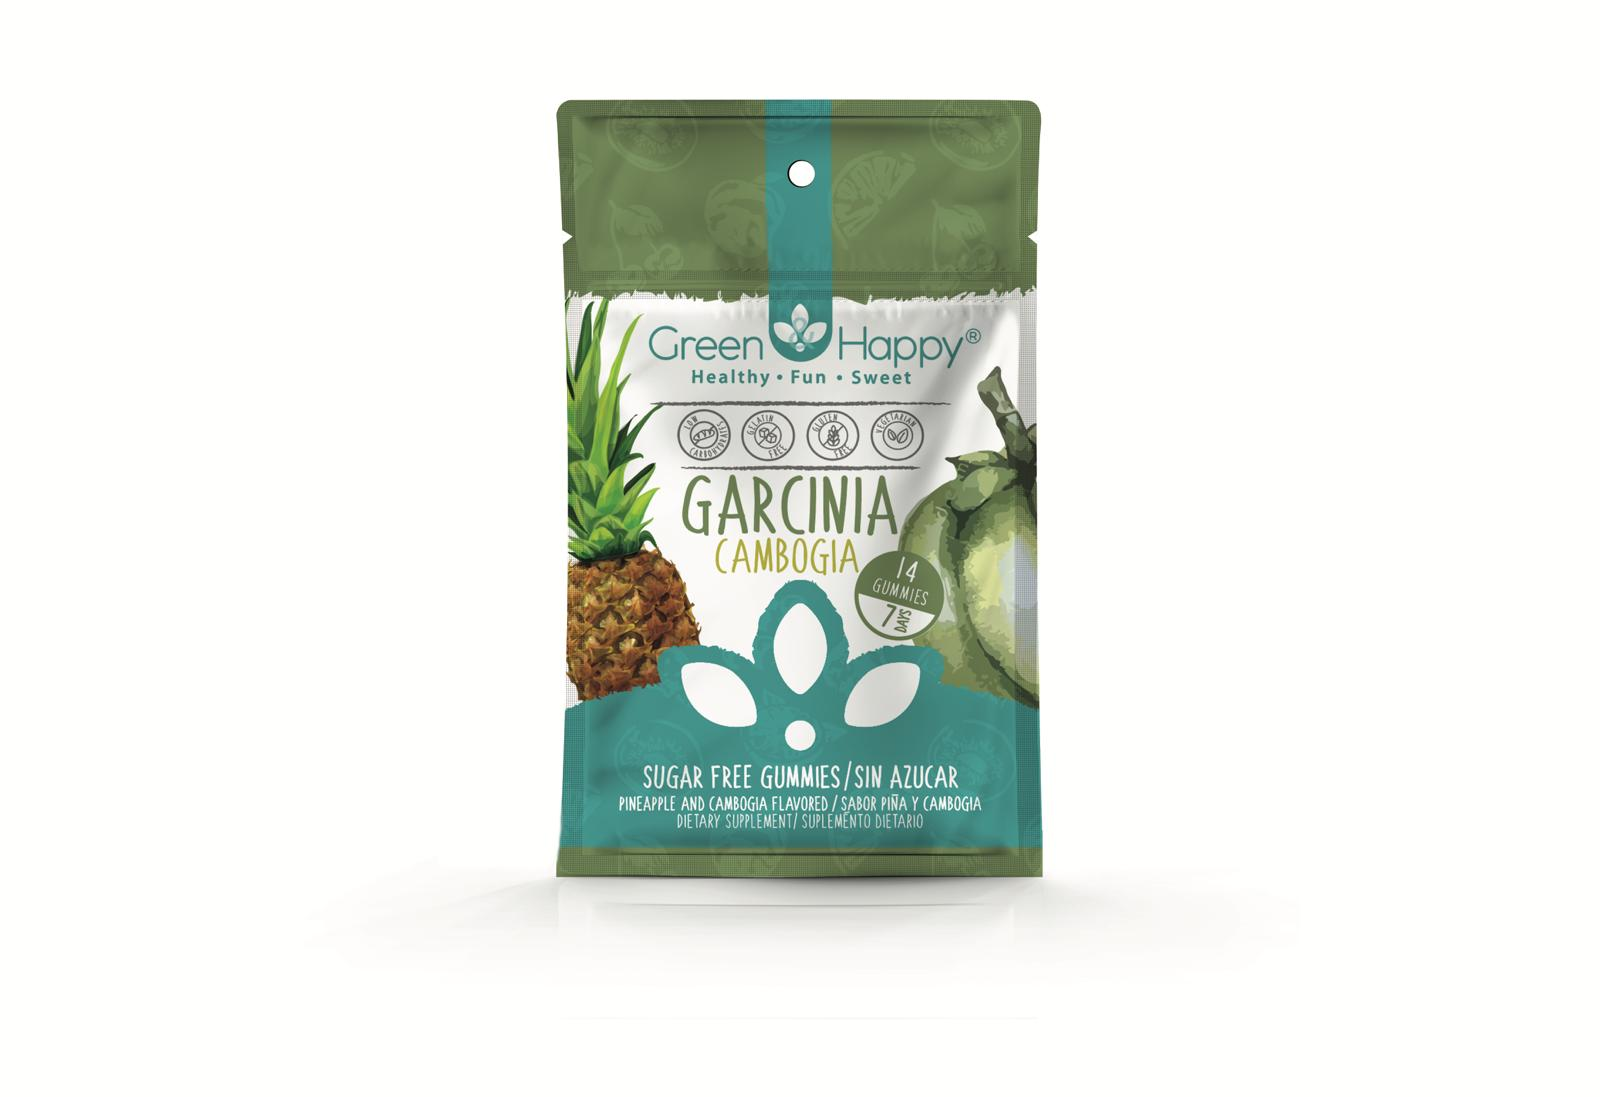 Garcinia Cambogia Gummies Green Happy